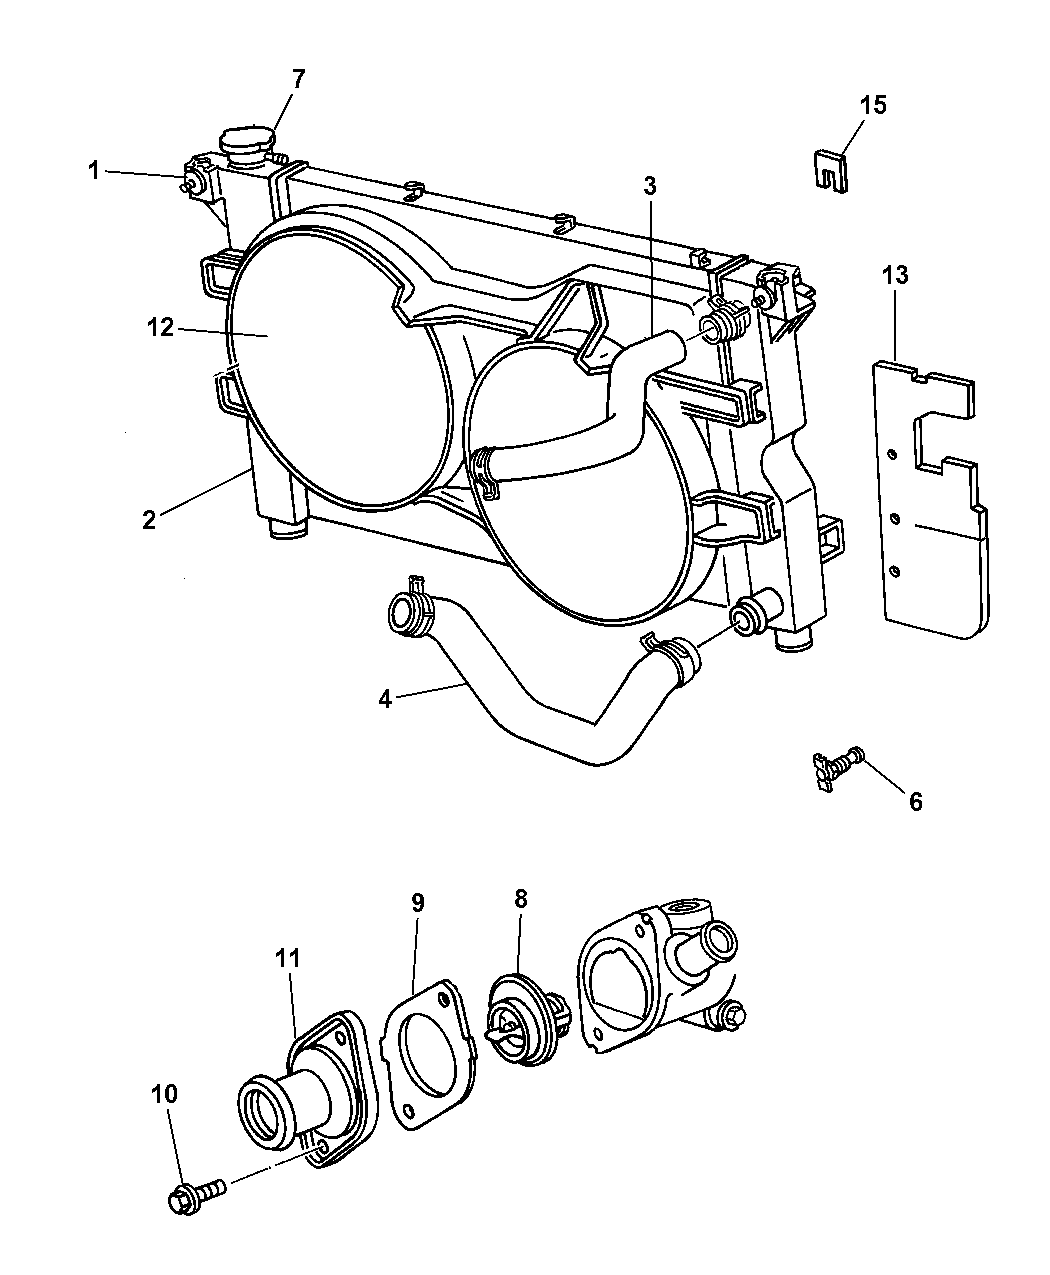 2002 Dodge Grand Caravan Radiator Related Parts Engine Cooling System Hoses Diagram Thumbnail 1